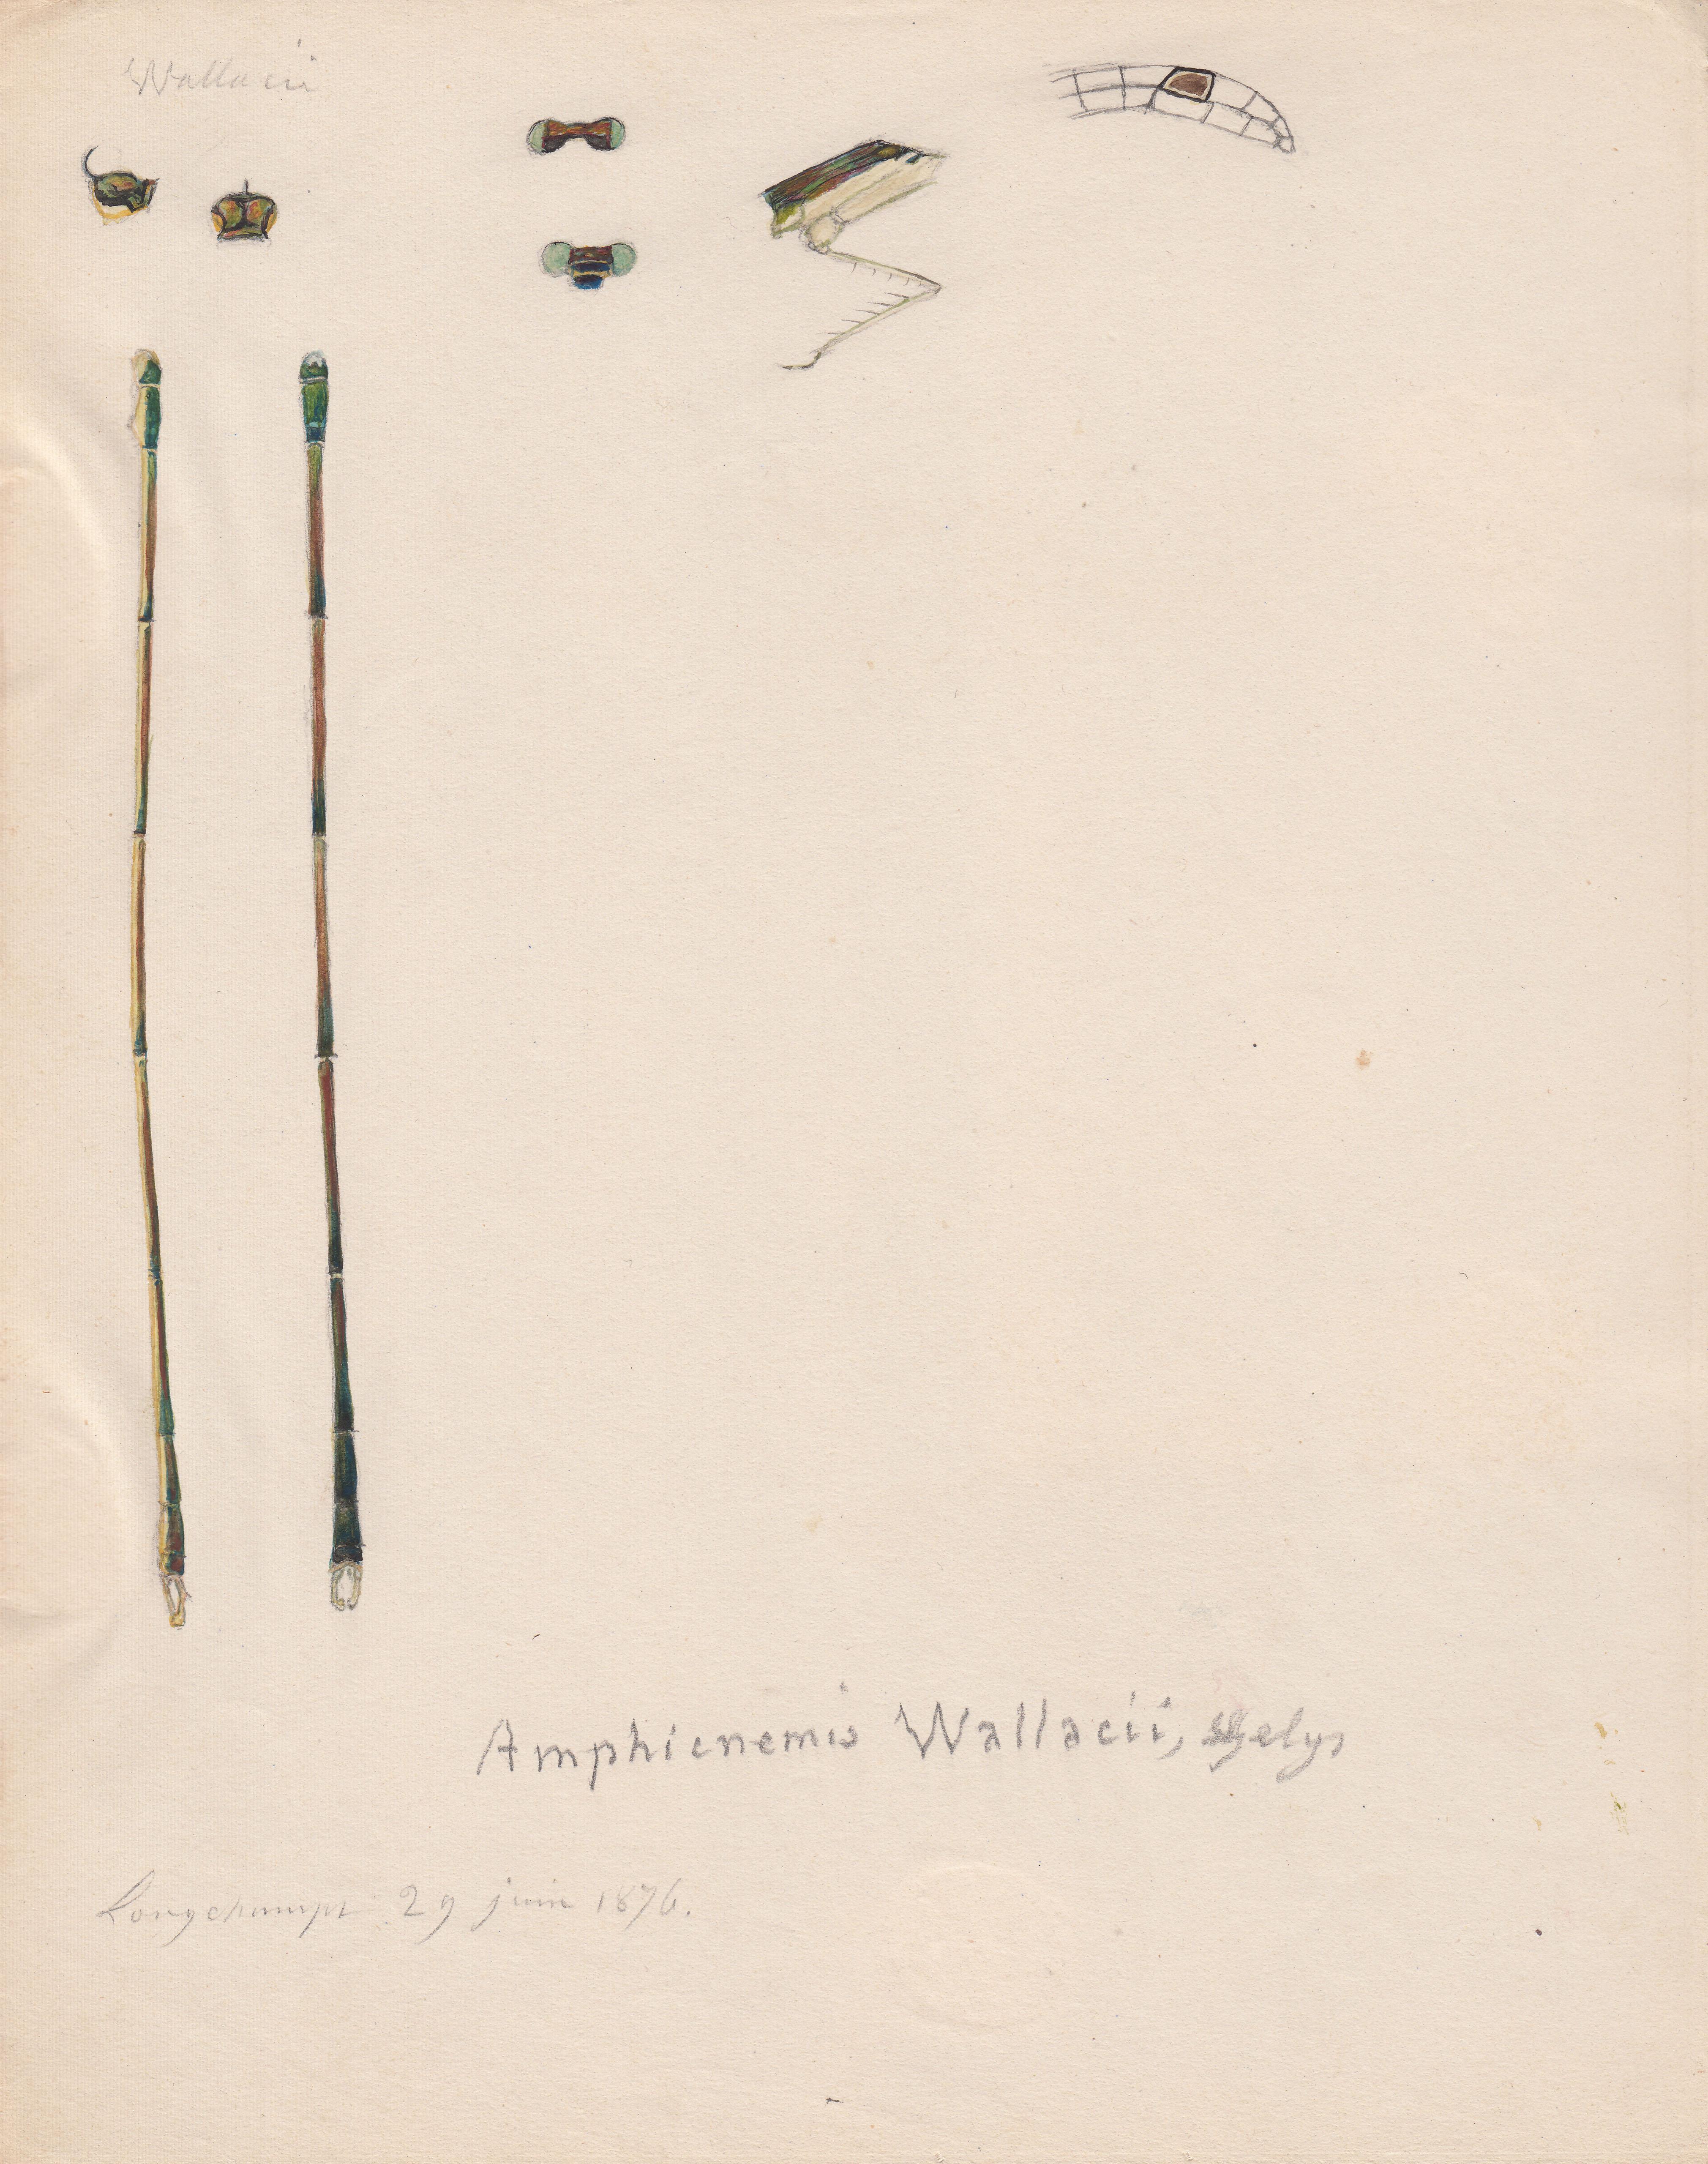 Amphicnemis wallacii.jpg